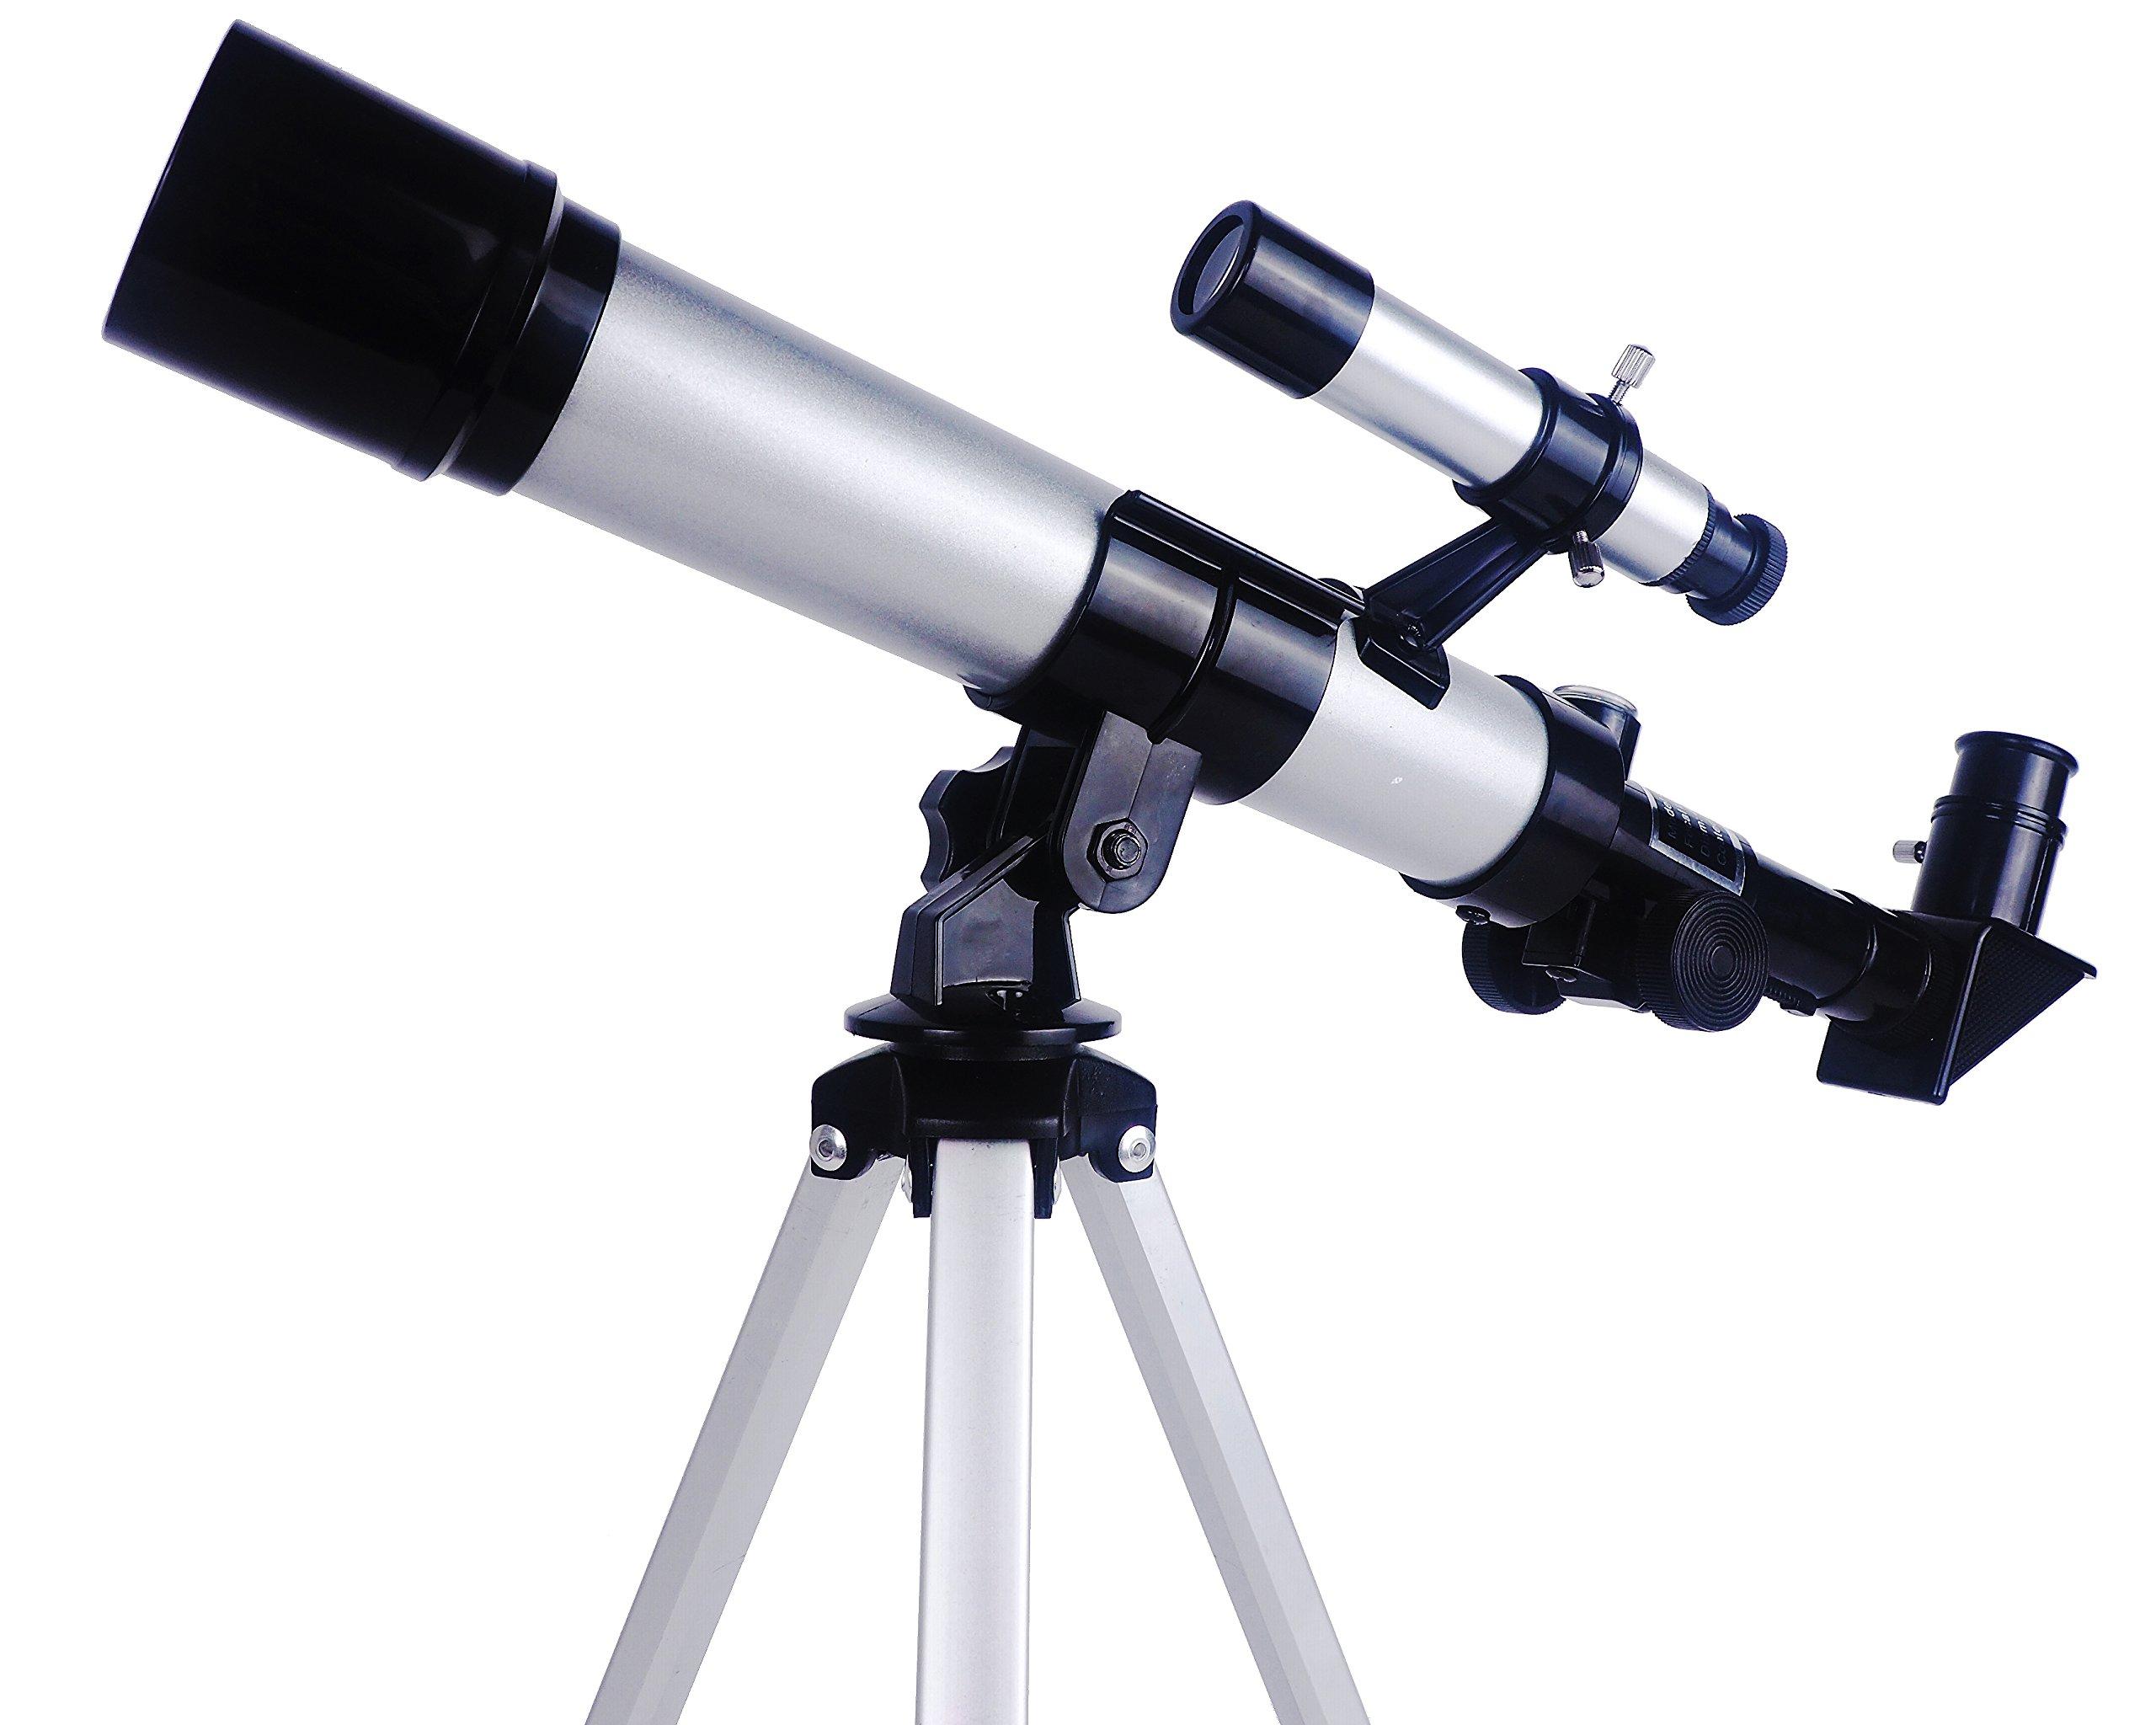 YA BEI SHANGMAO Children's Telescope, Nature Exploration Toys, Children's Astronomical Science Kit,Telescope, Aluminum Tripod, Beginner Telescope & Portable Telescope, Science Toys